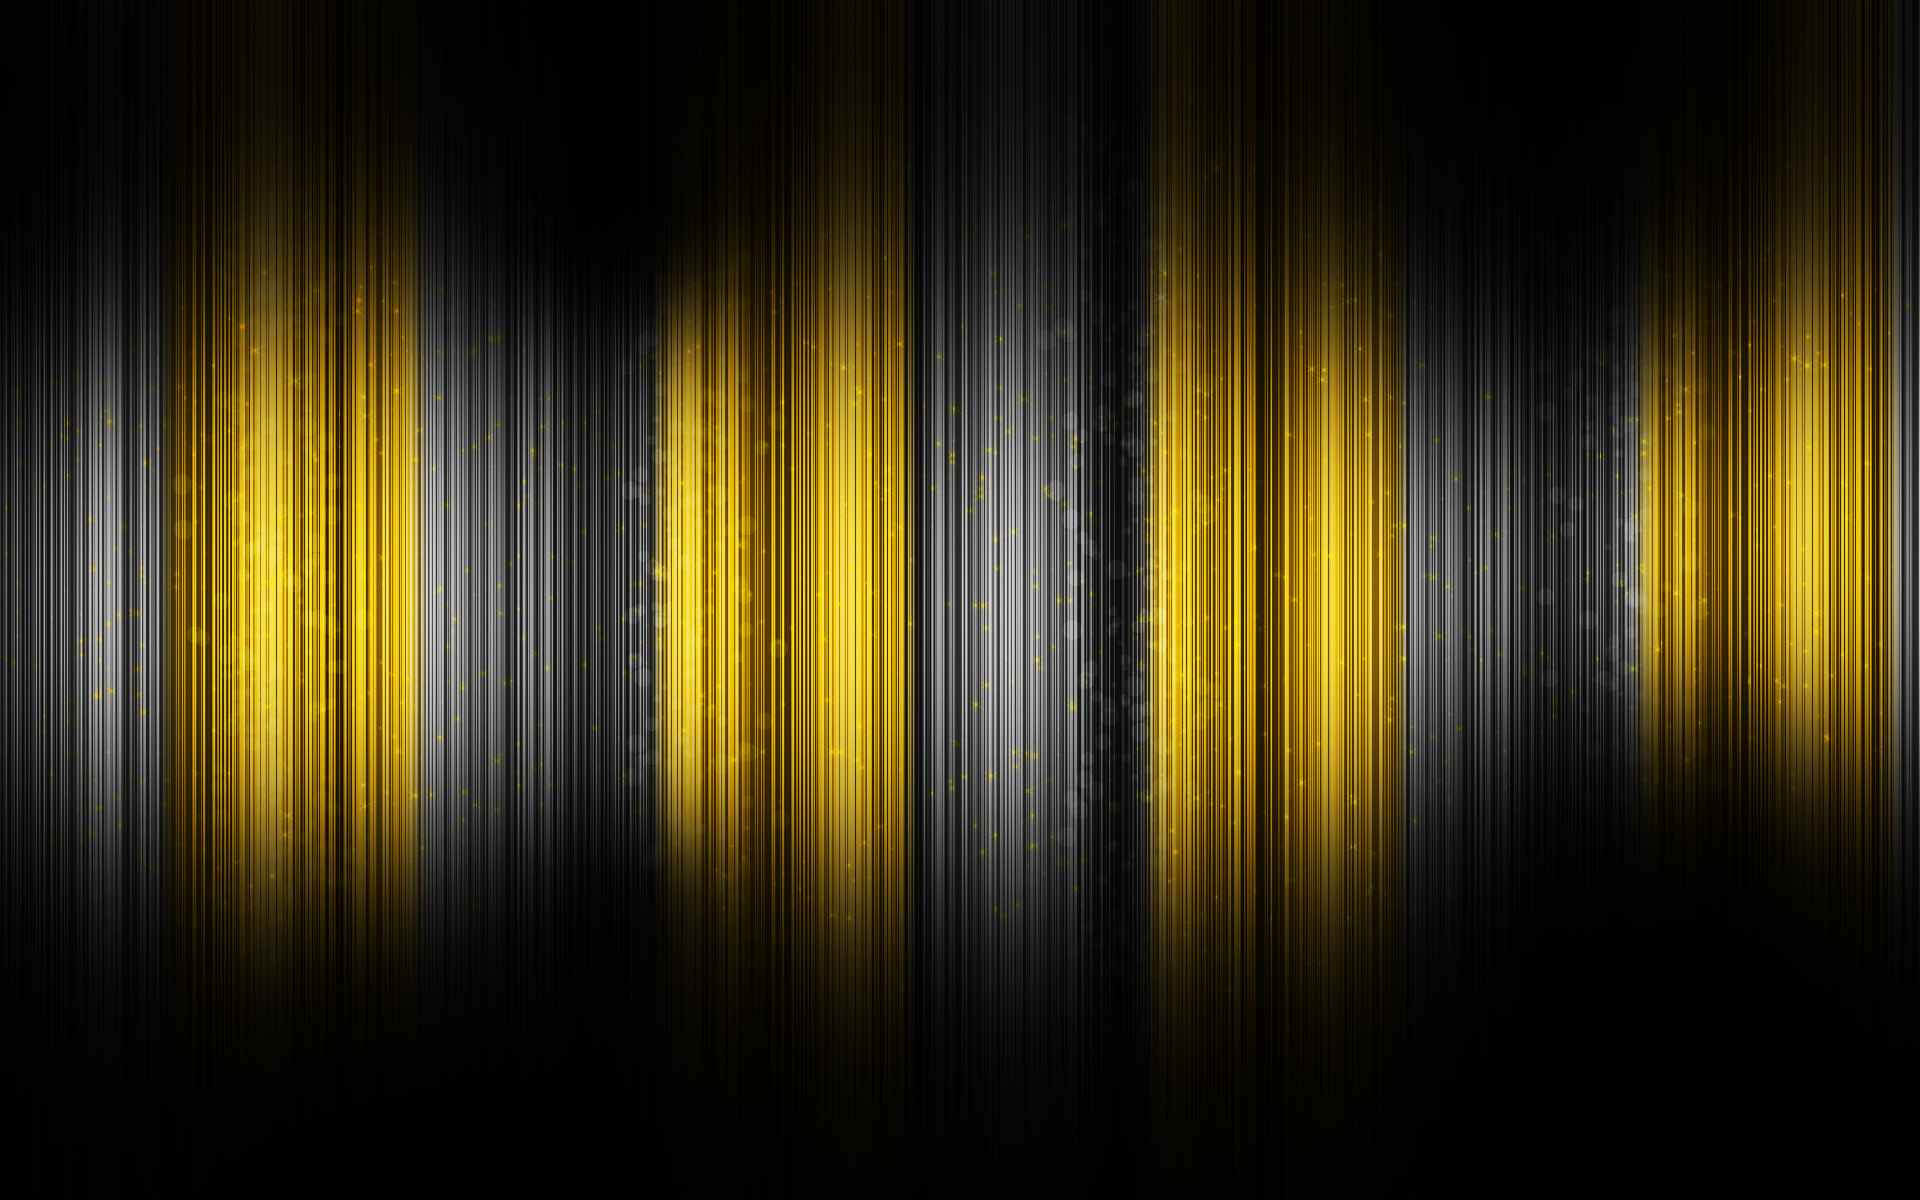 47 Black And Gold Hd Wallpaper On Wallpapersafari